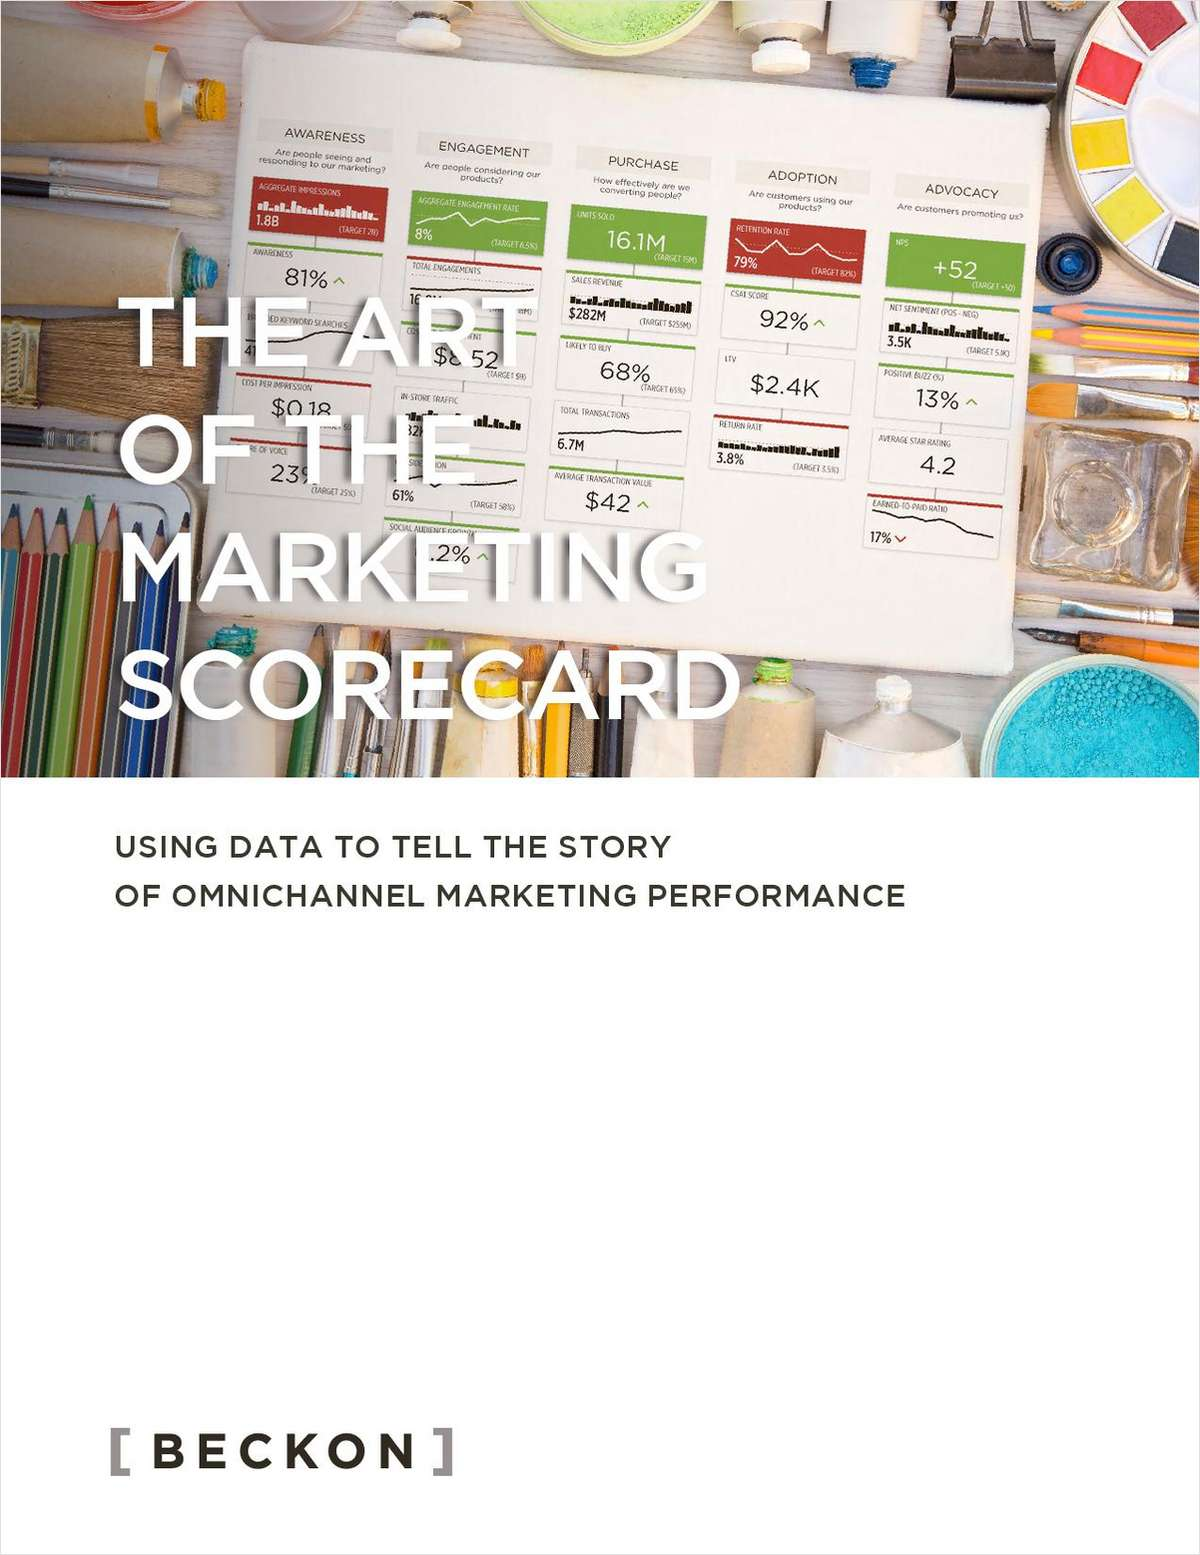 http://magz.tradepub.com/free-offer/the-art-of-the-marketing-scorecard/w_beck02?sr=hicat&_t=hicat:1211